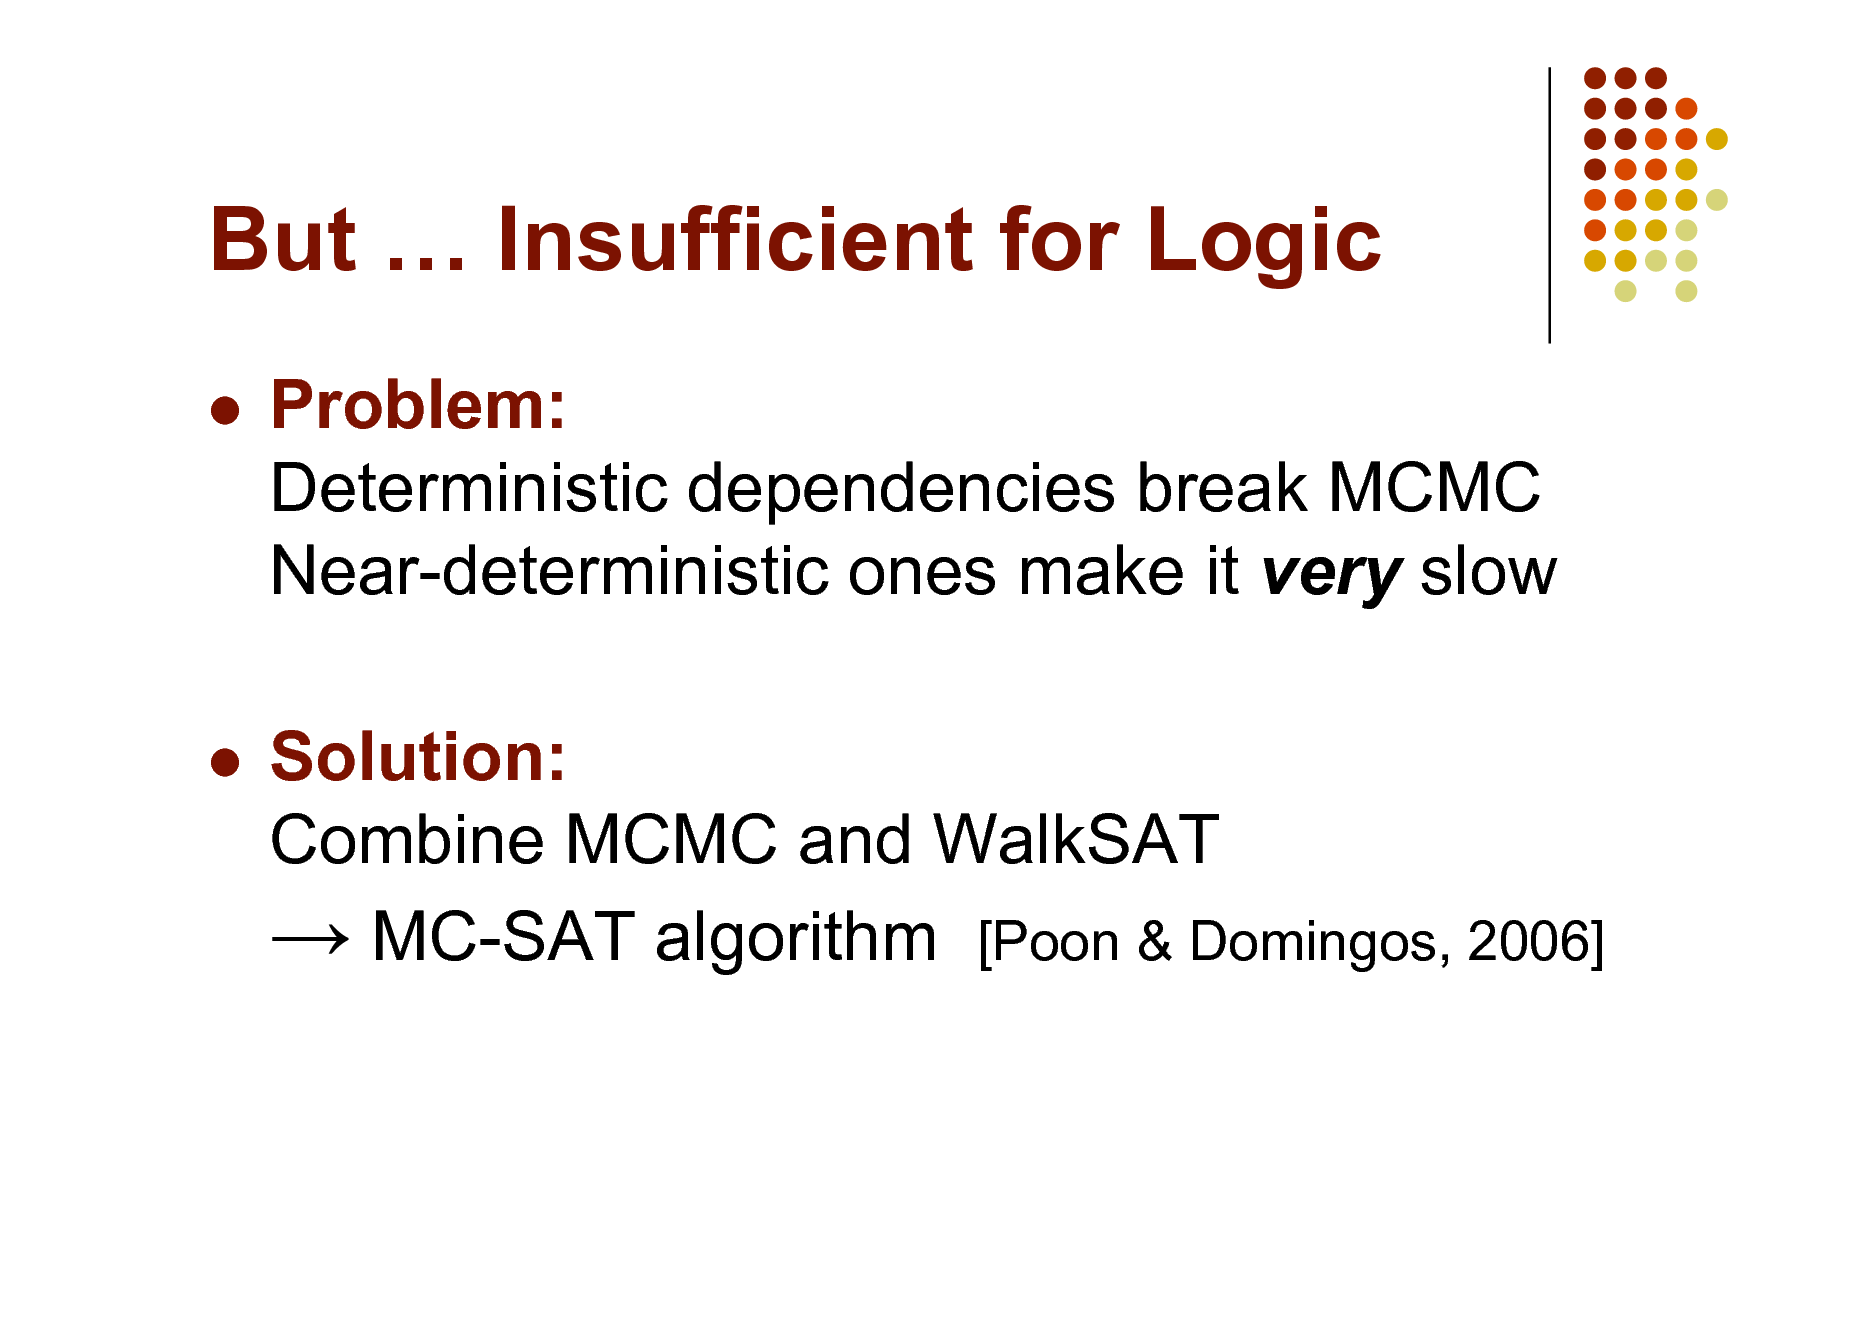 Slide: But  Insufficient for Logic   Problem: Deterministic dependencies break MCMC Near-deterministic ones make it very slow Solution: Combine MCMC and WalkSAT  MC-SAT algorithm [Poon & Domingos, 2006]